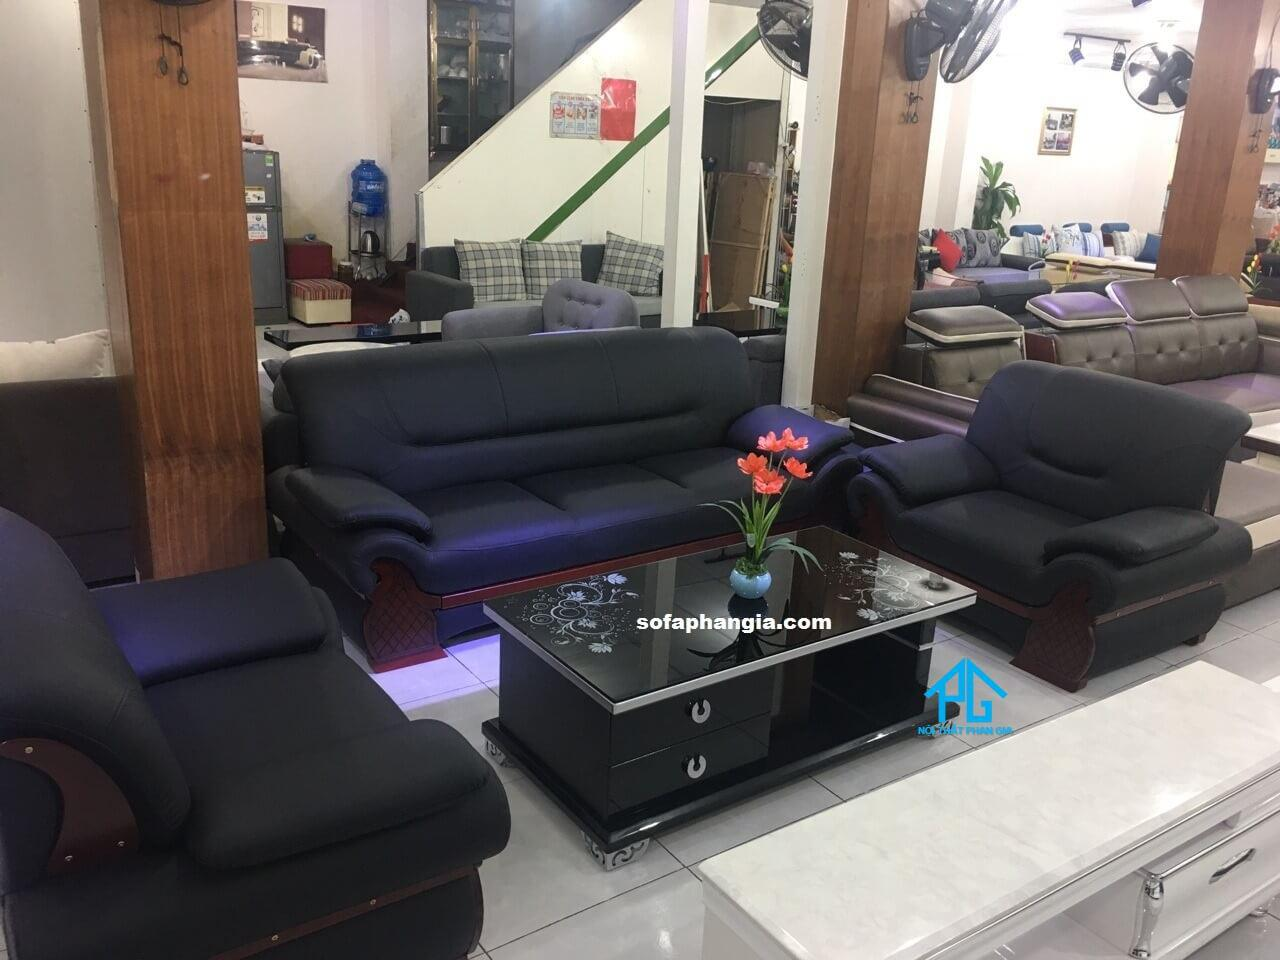 sofa da chất lượng hcm;